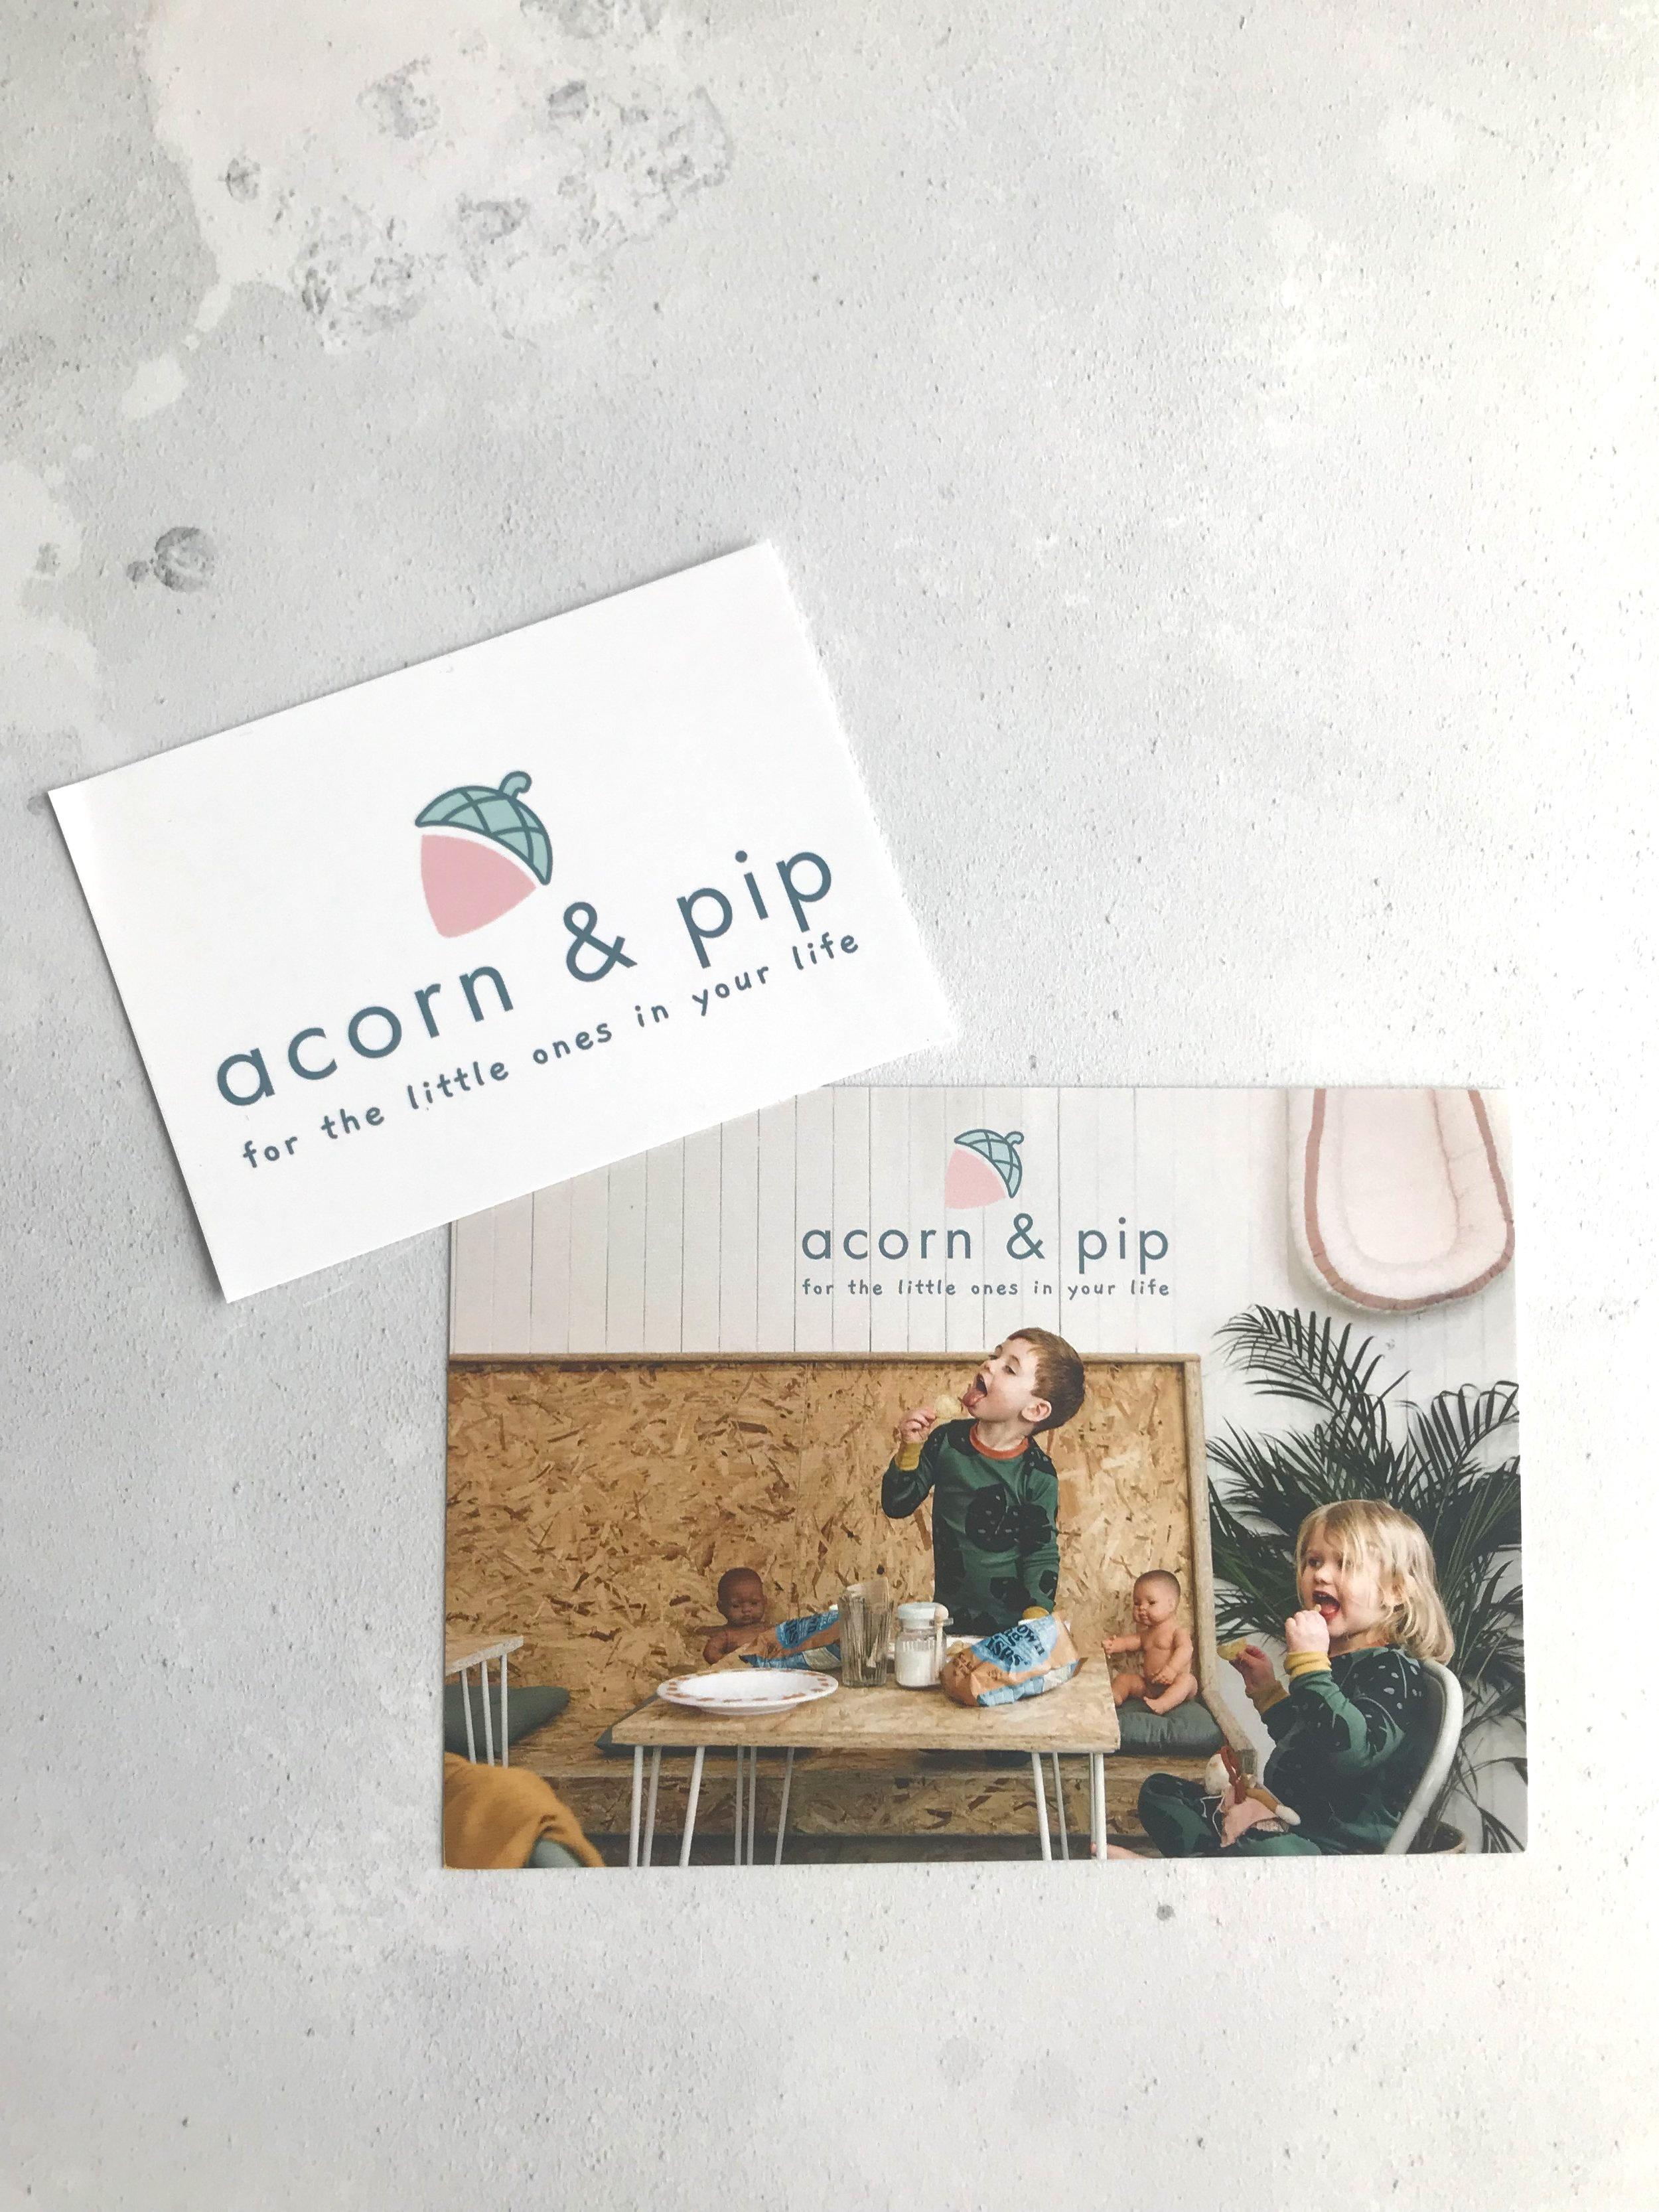 ACORN & PIP | POSTCARD & FLYER DESIGN